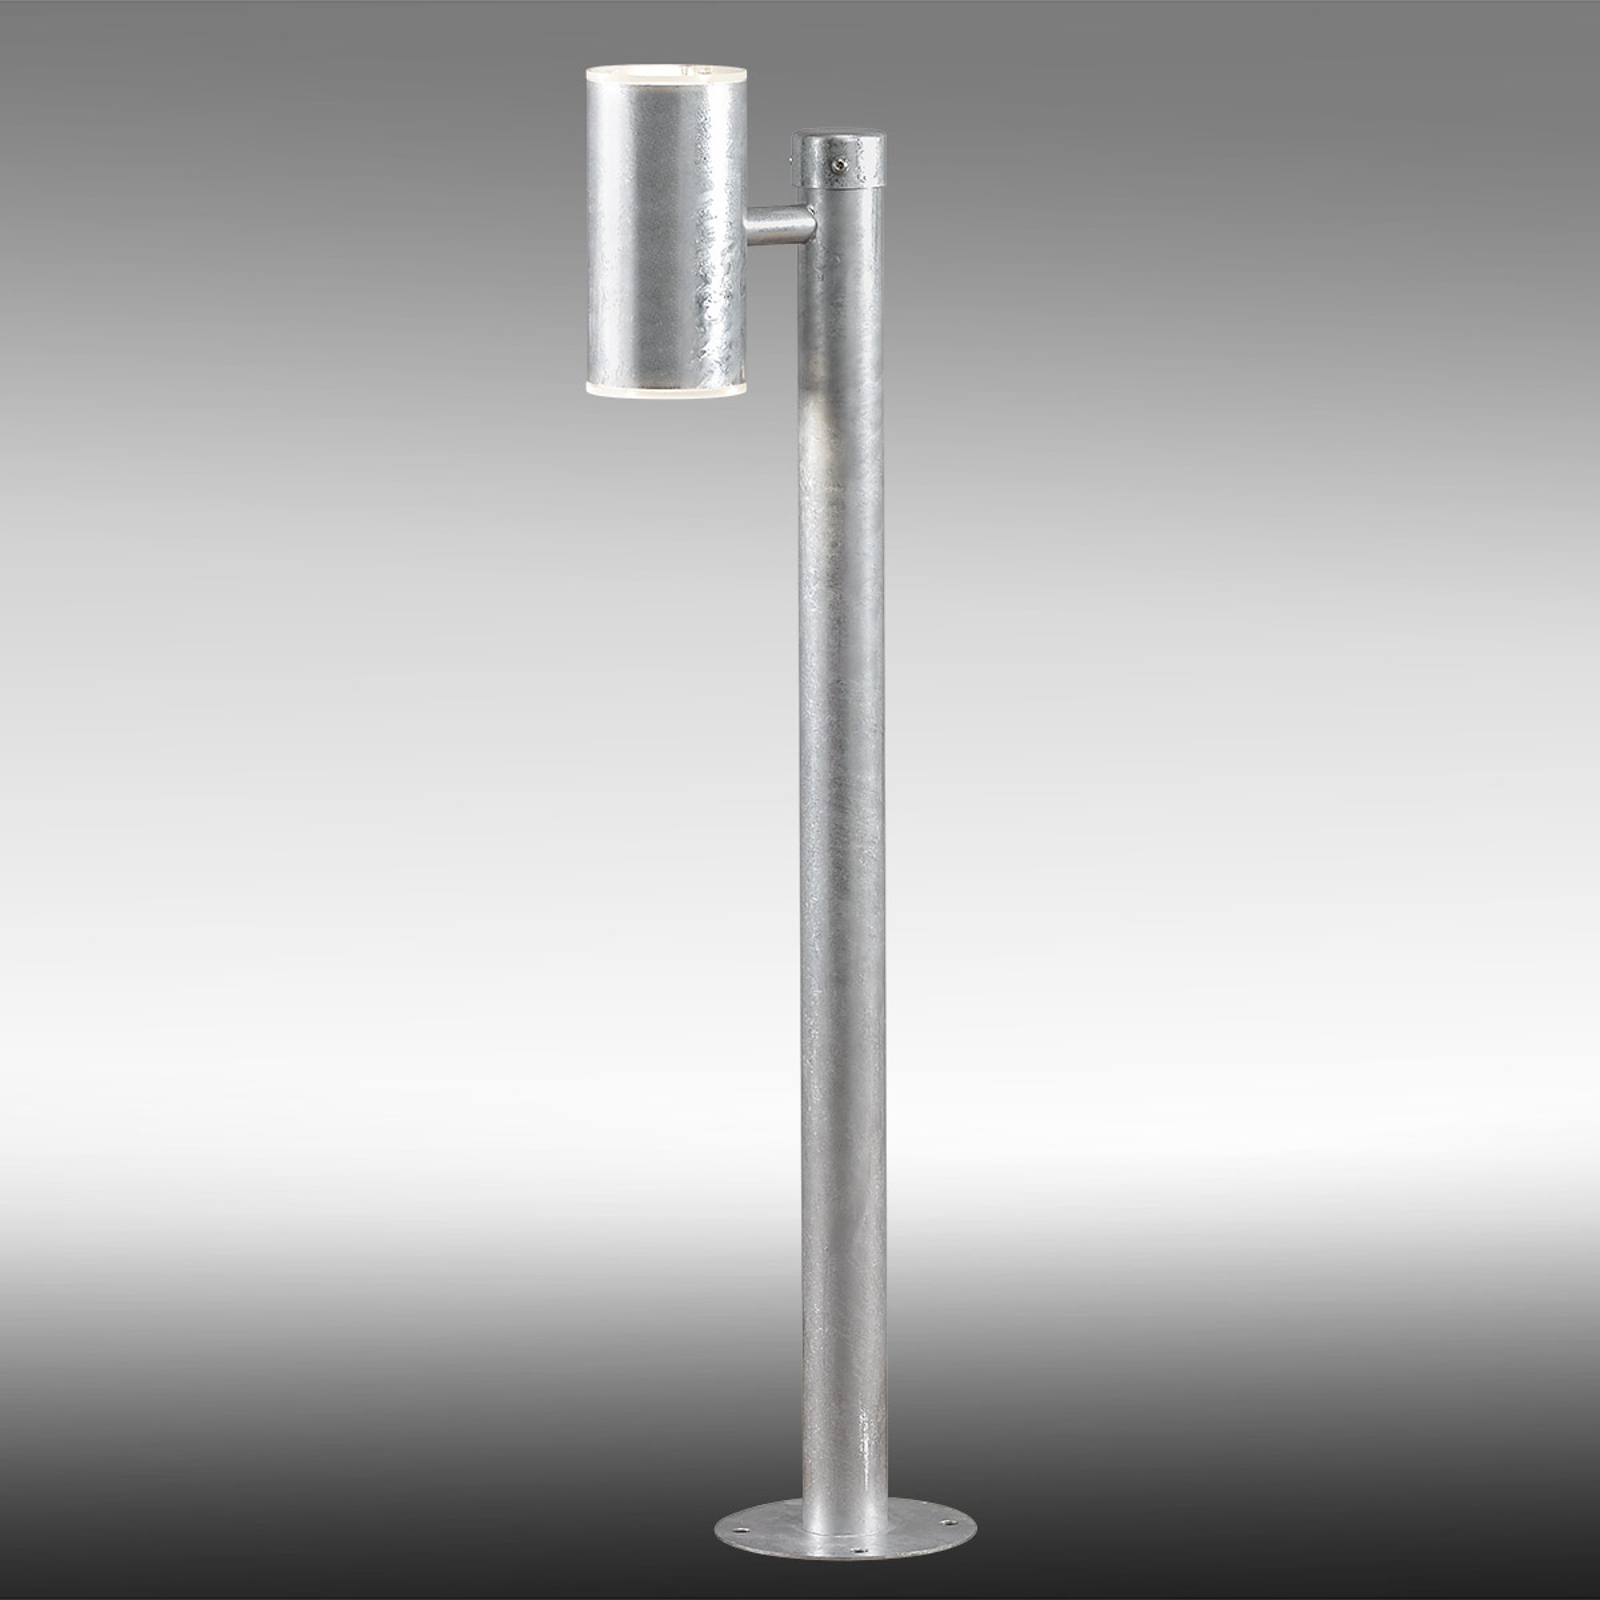 Varmförzinkad Ull LED väglampa – IP54, dimbar